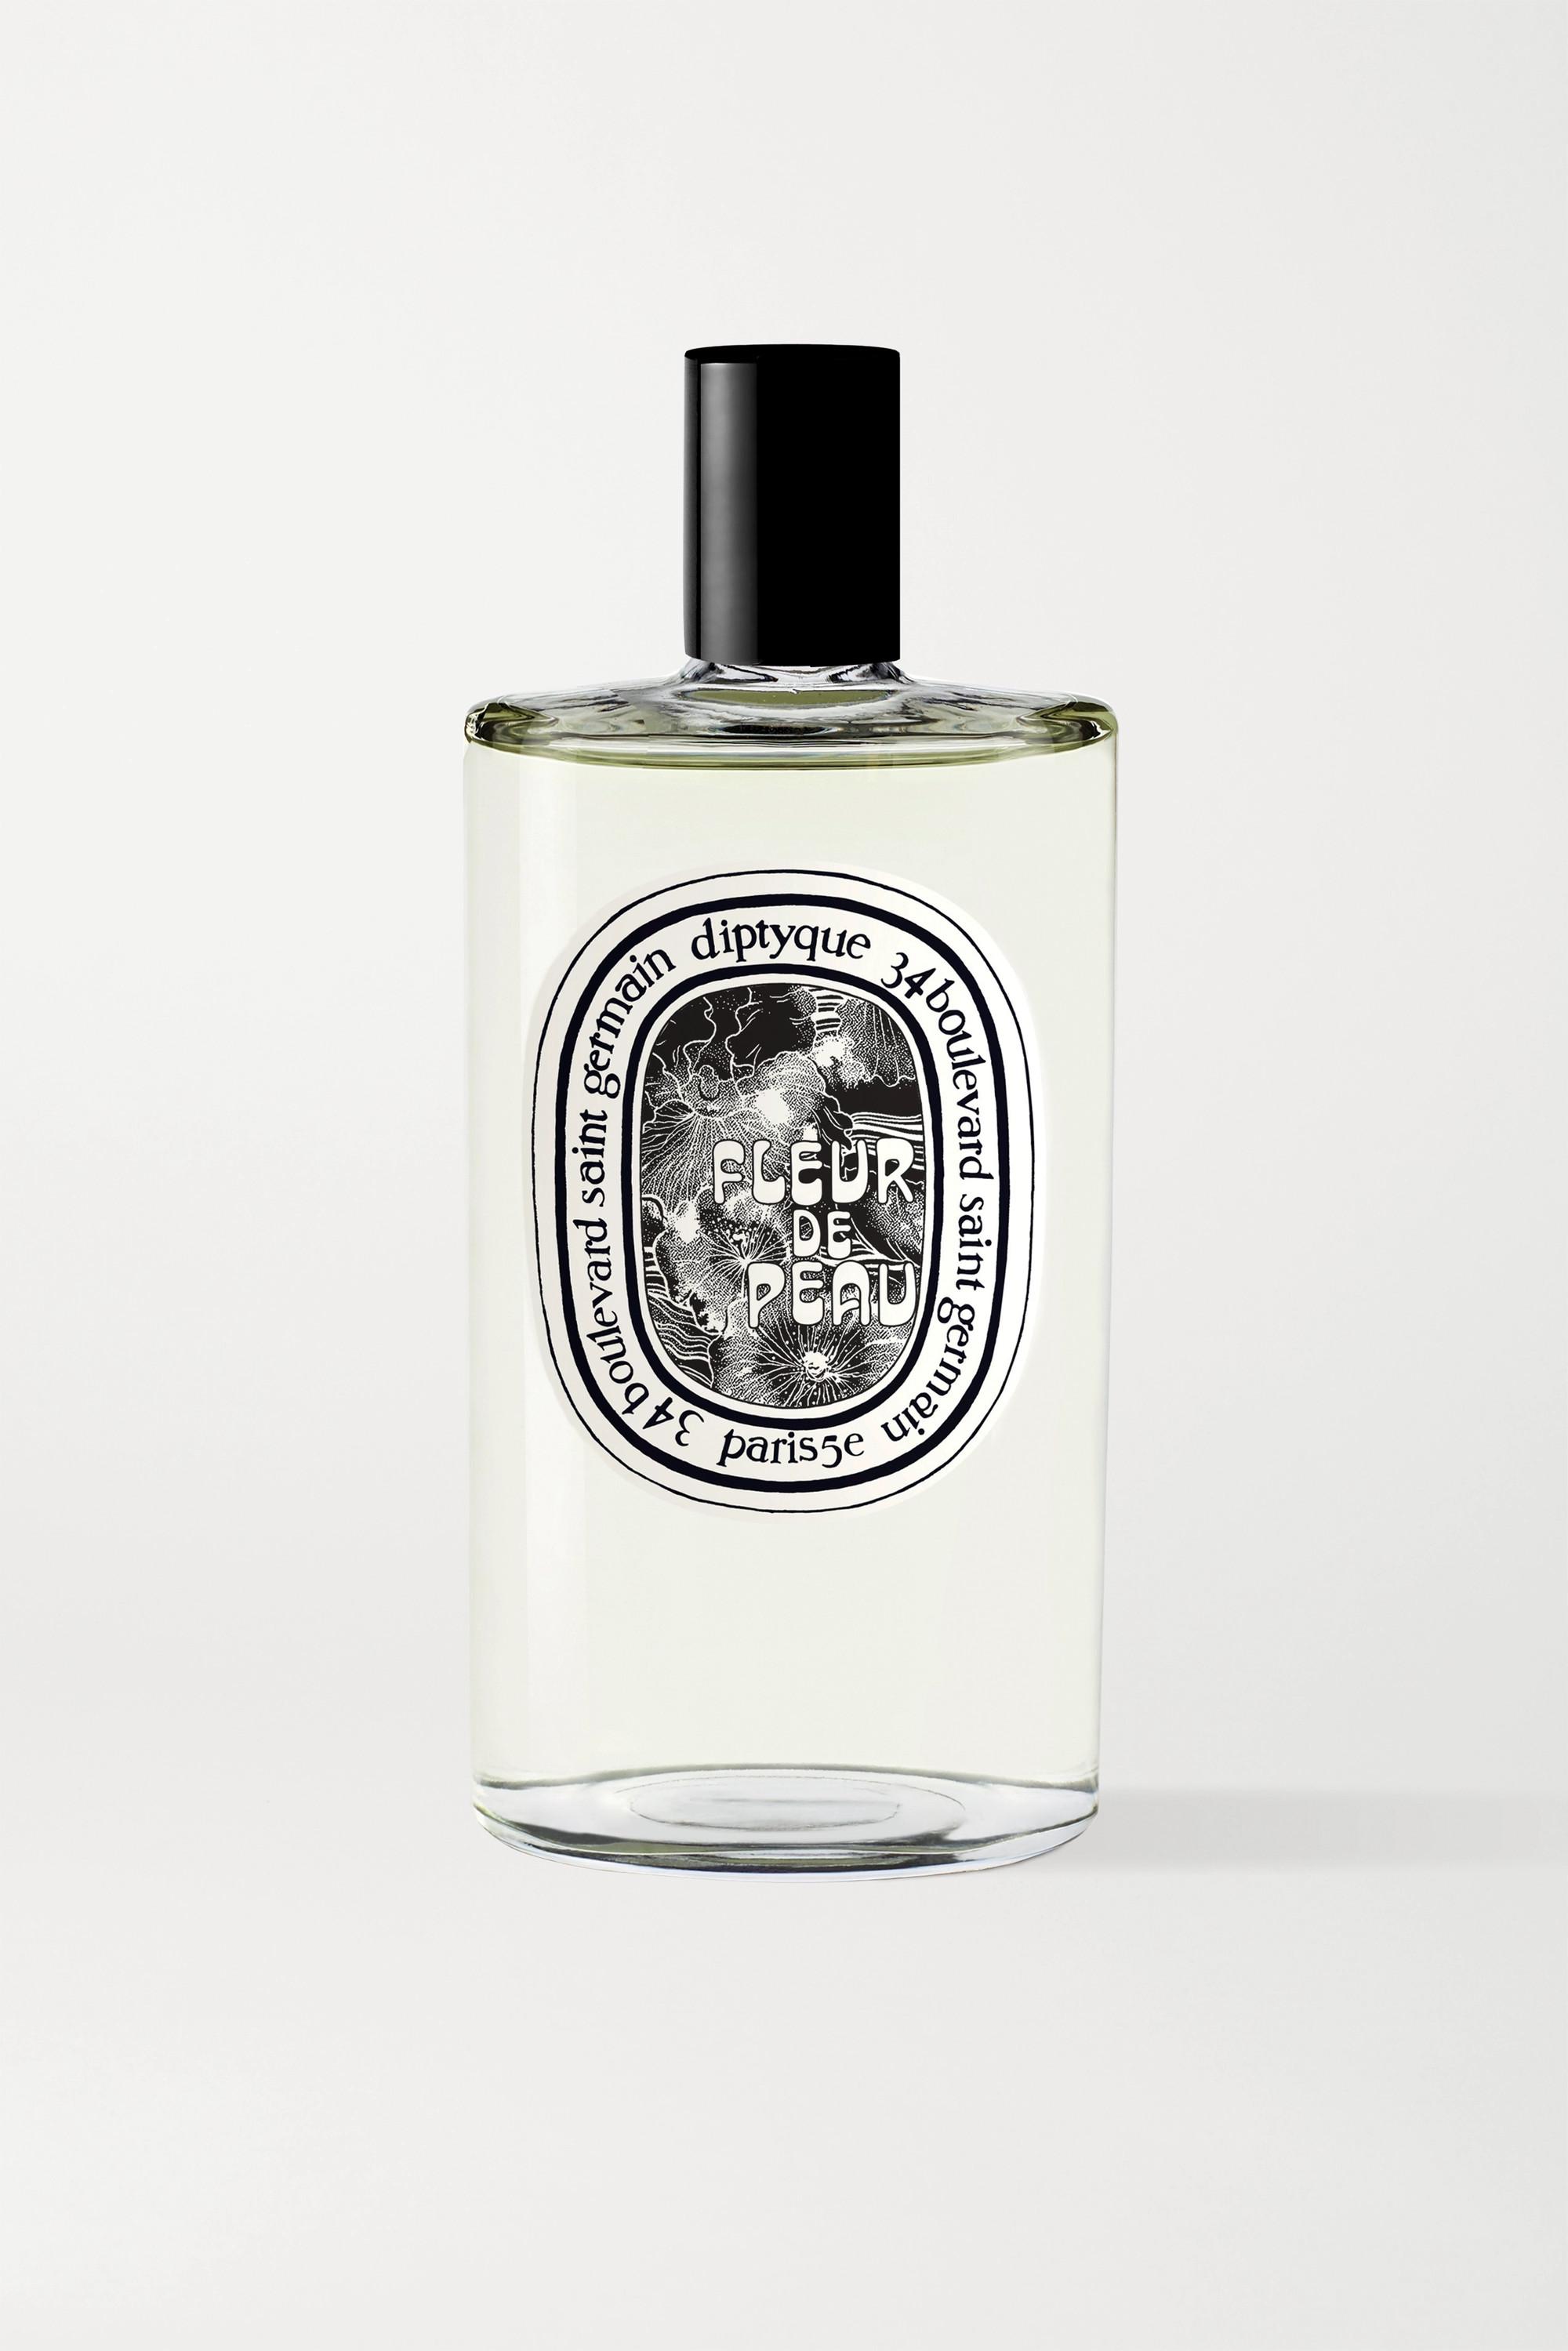 Diptyque Fleur de Peau Multi-Use Fragrance, 200 ml – Duftspray